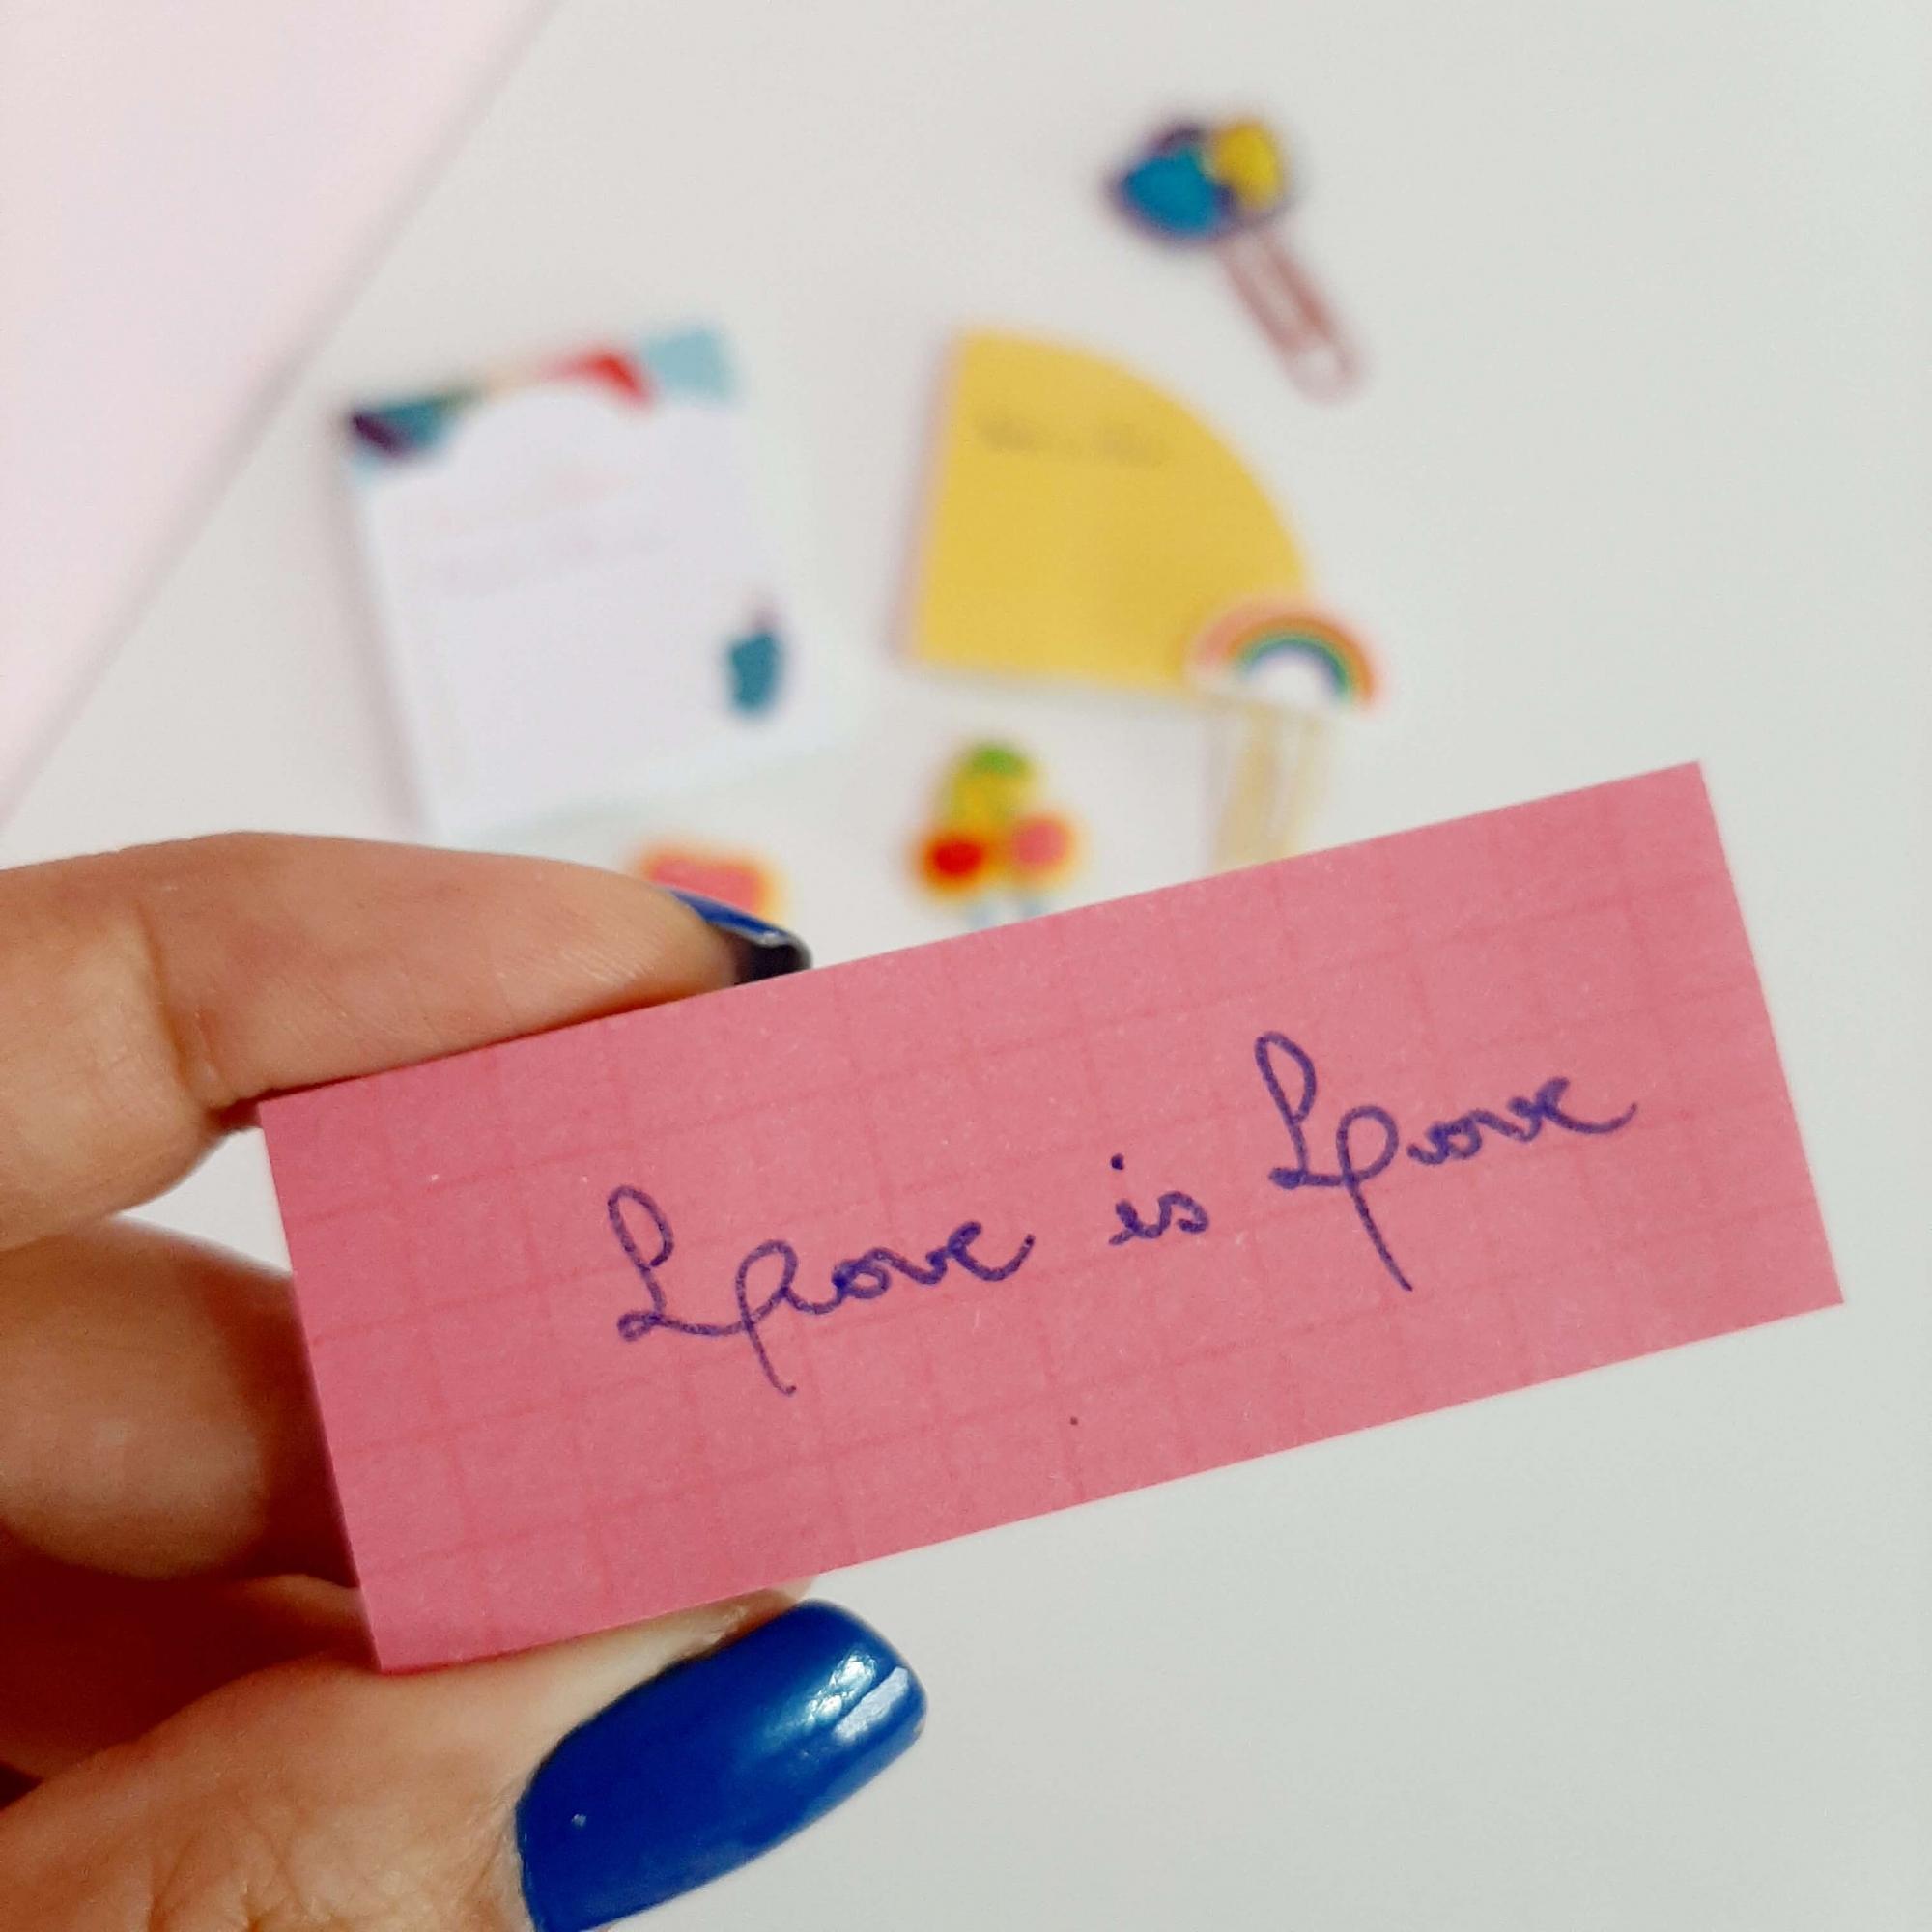 Kit Bloco Adesivo Love is Love 3 Blocos Jocar Office